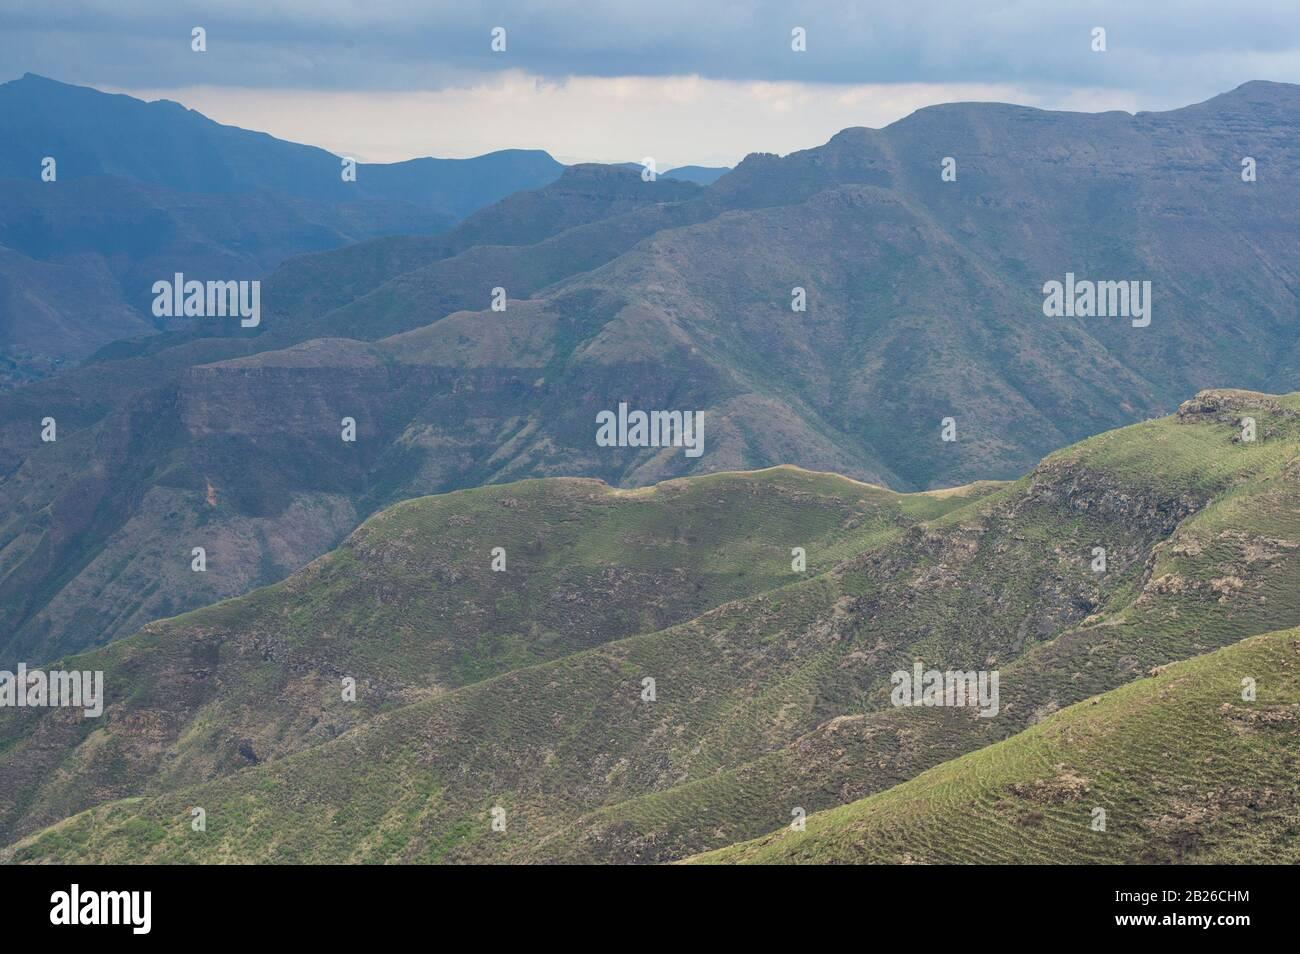 Paisaje montañoso, Parque Nacional Ts'ehlanyane, Lesotho Foto de stock